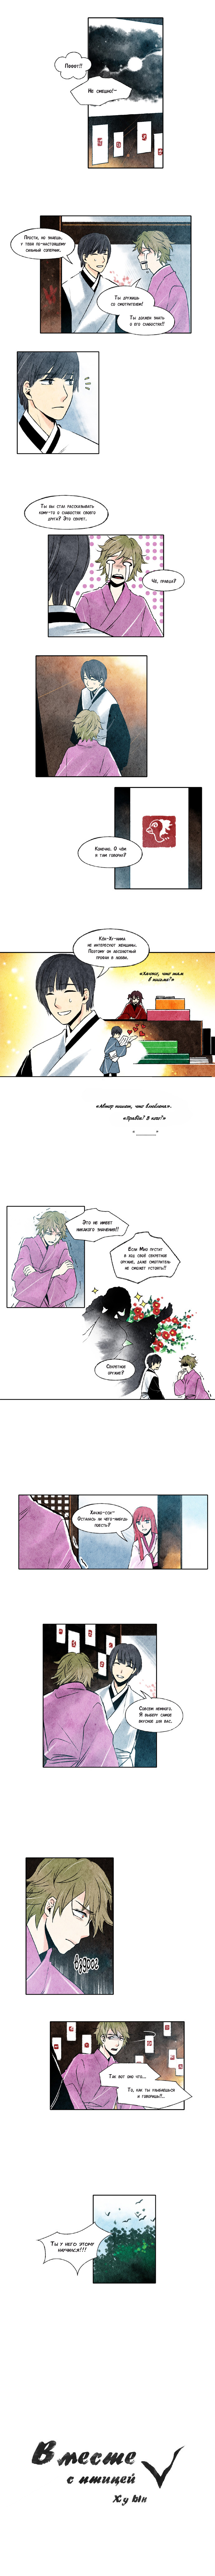 https://r1.ninemanga.com/comics/pic2/39/22503/416382/153288437726.jpg Page 1